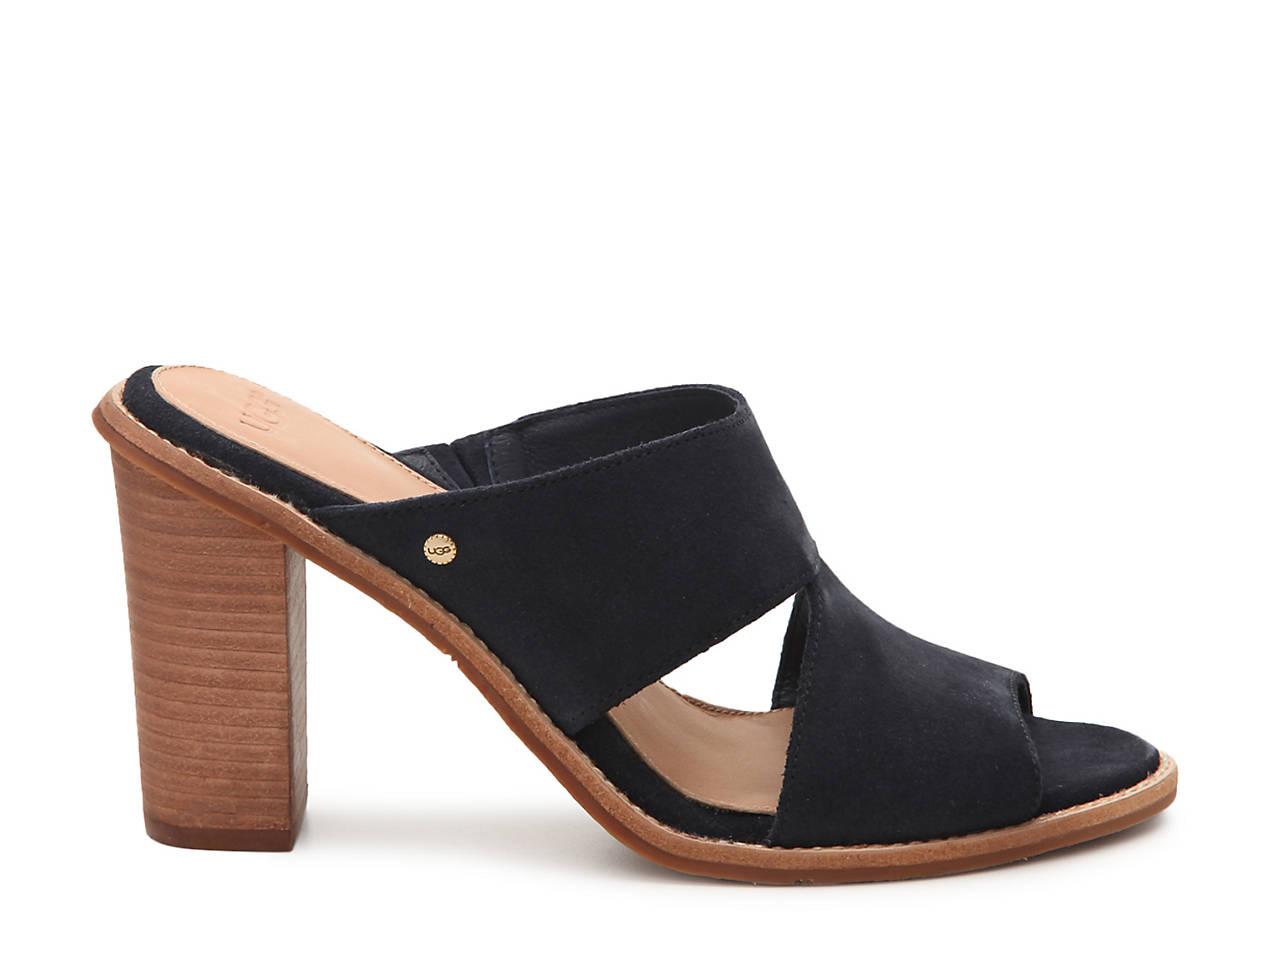 8cb19a736f1 UGG Celia Sandal Women s Shoes